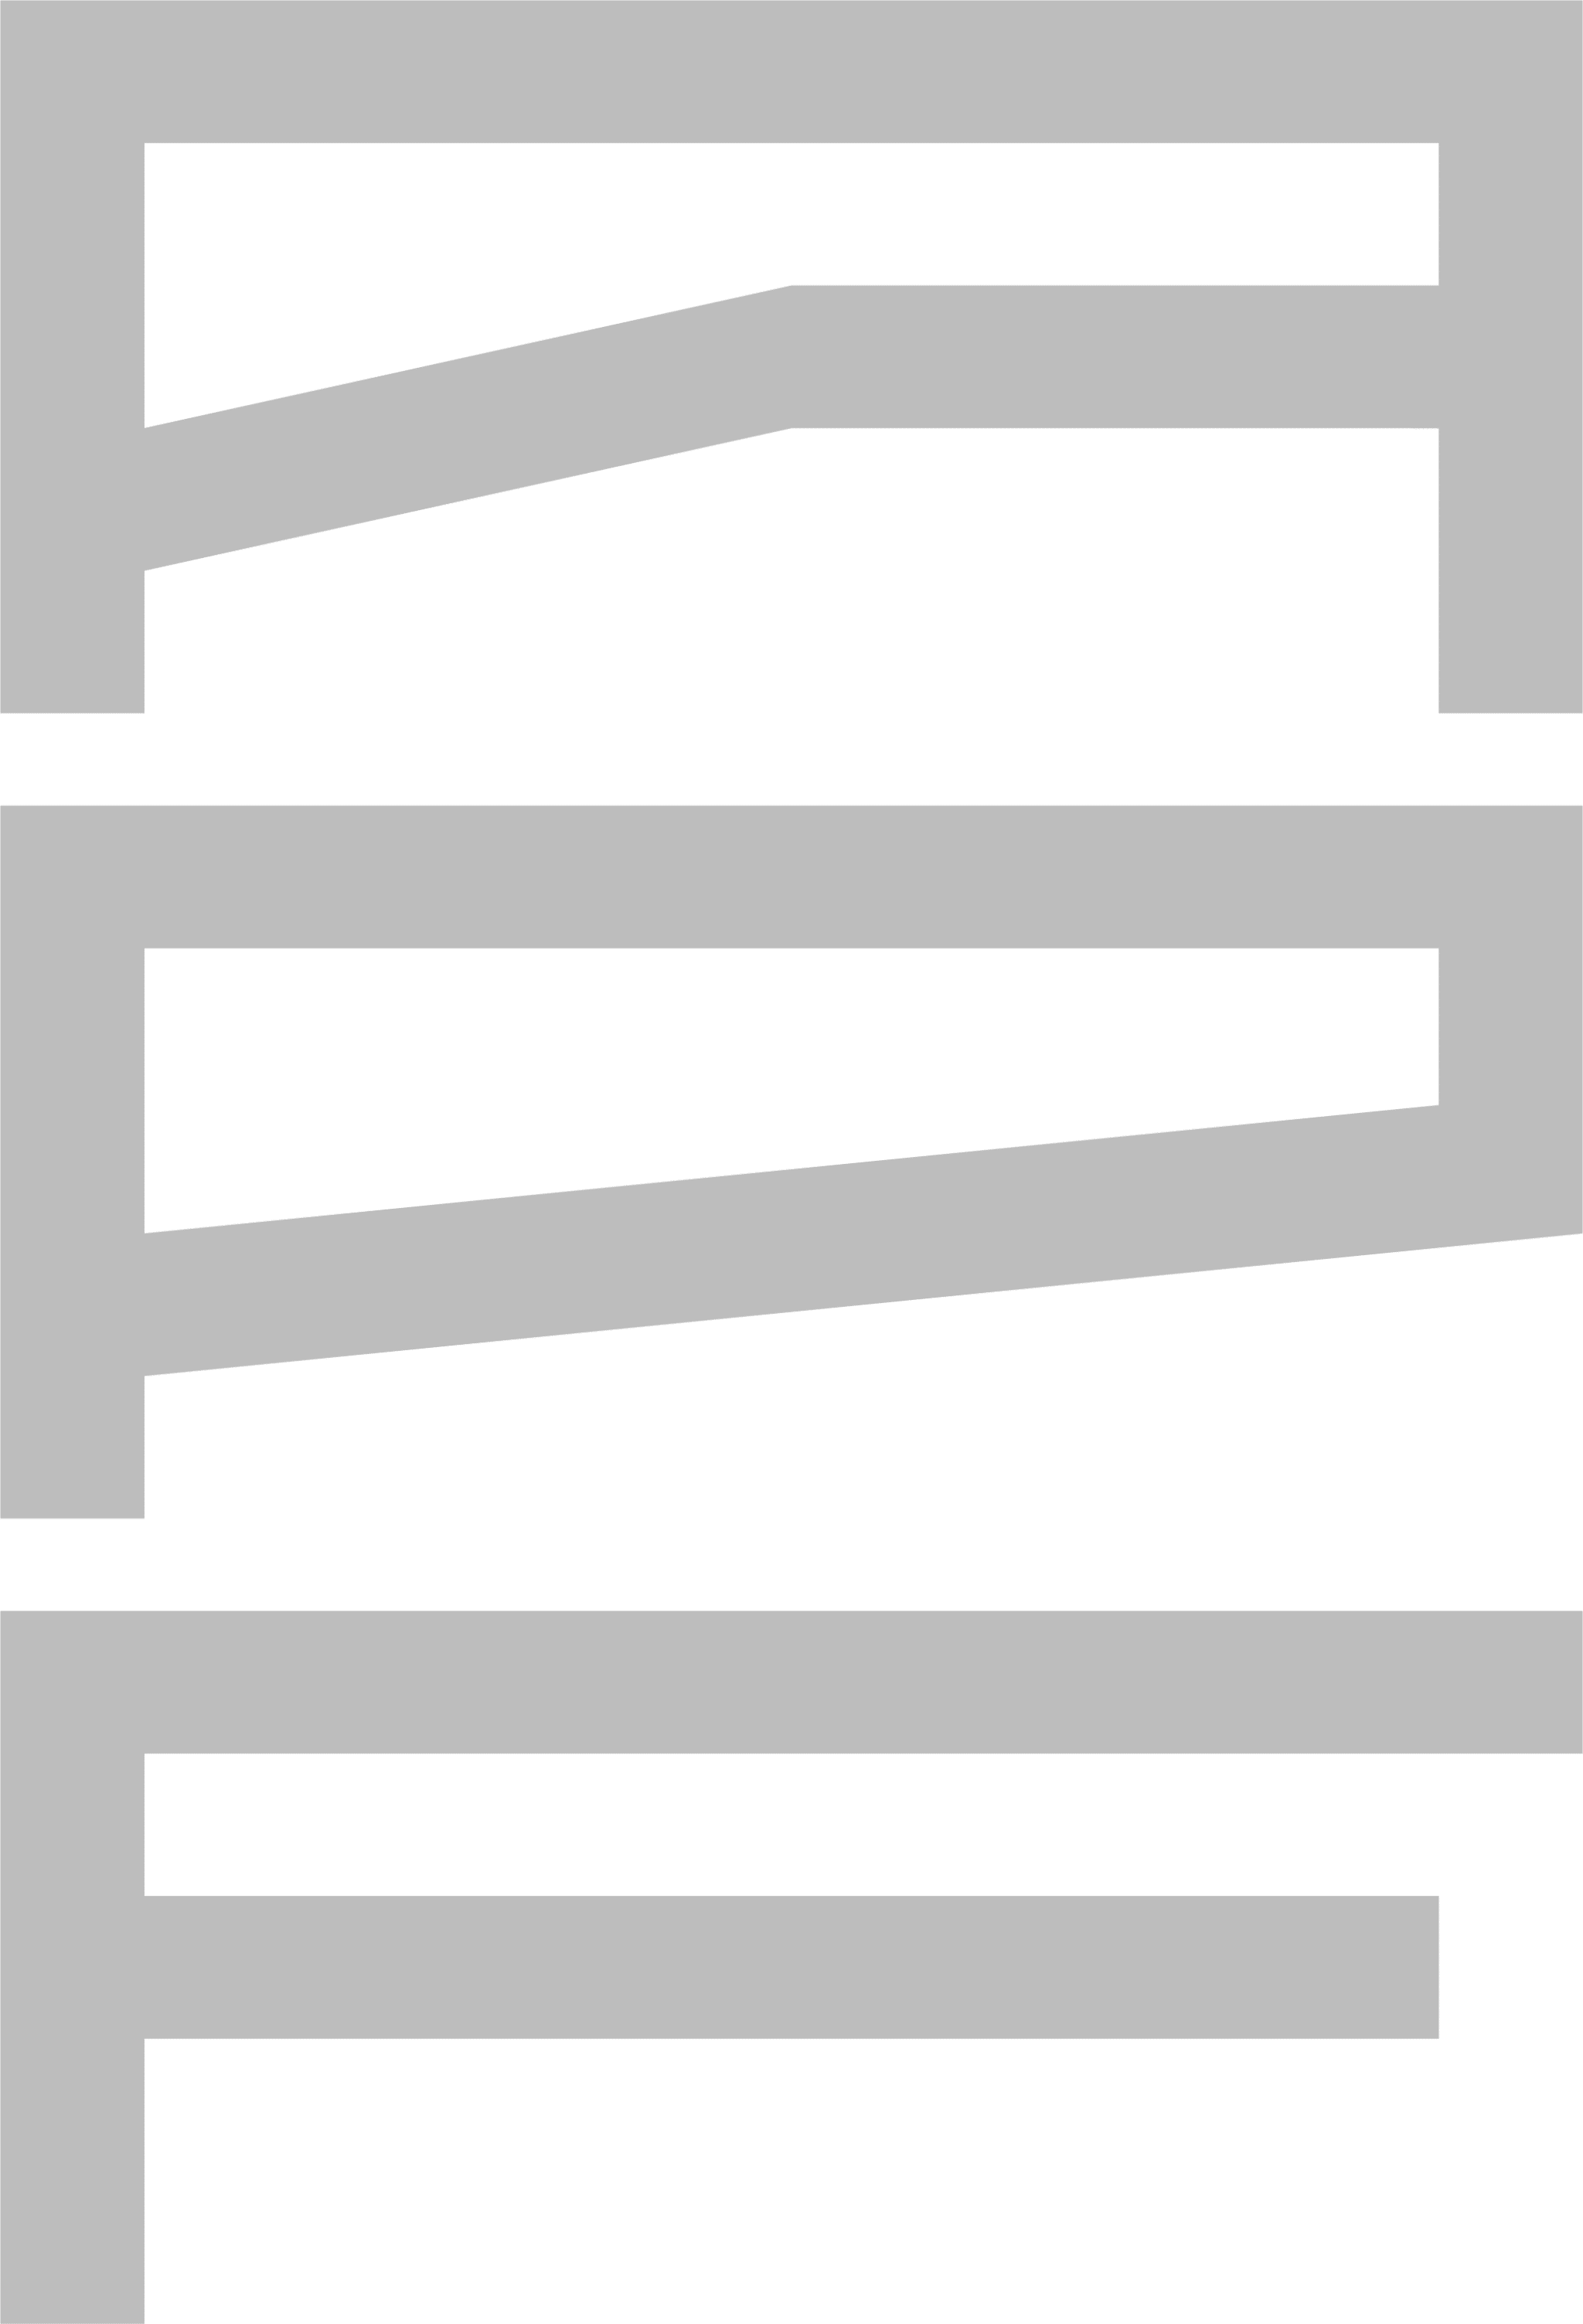 LOGO APF_2 SEPTERMNER_DEF